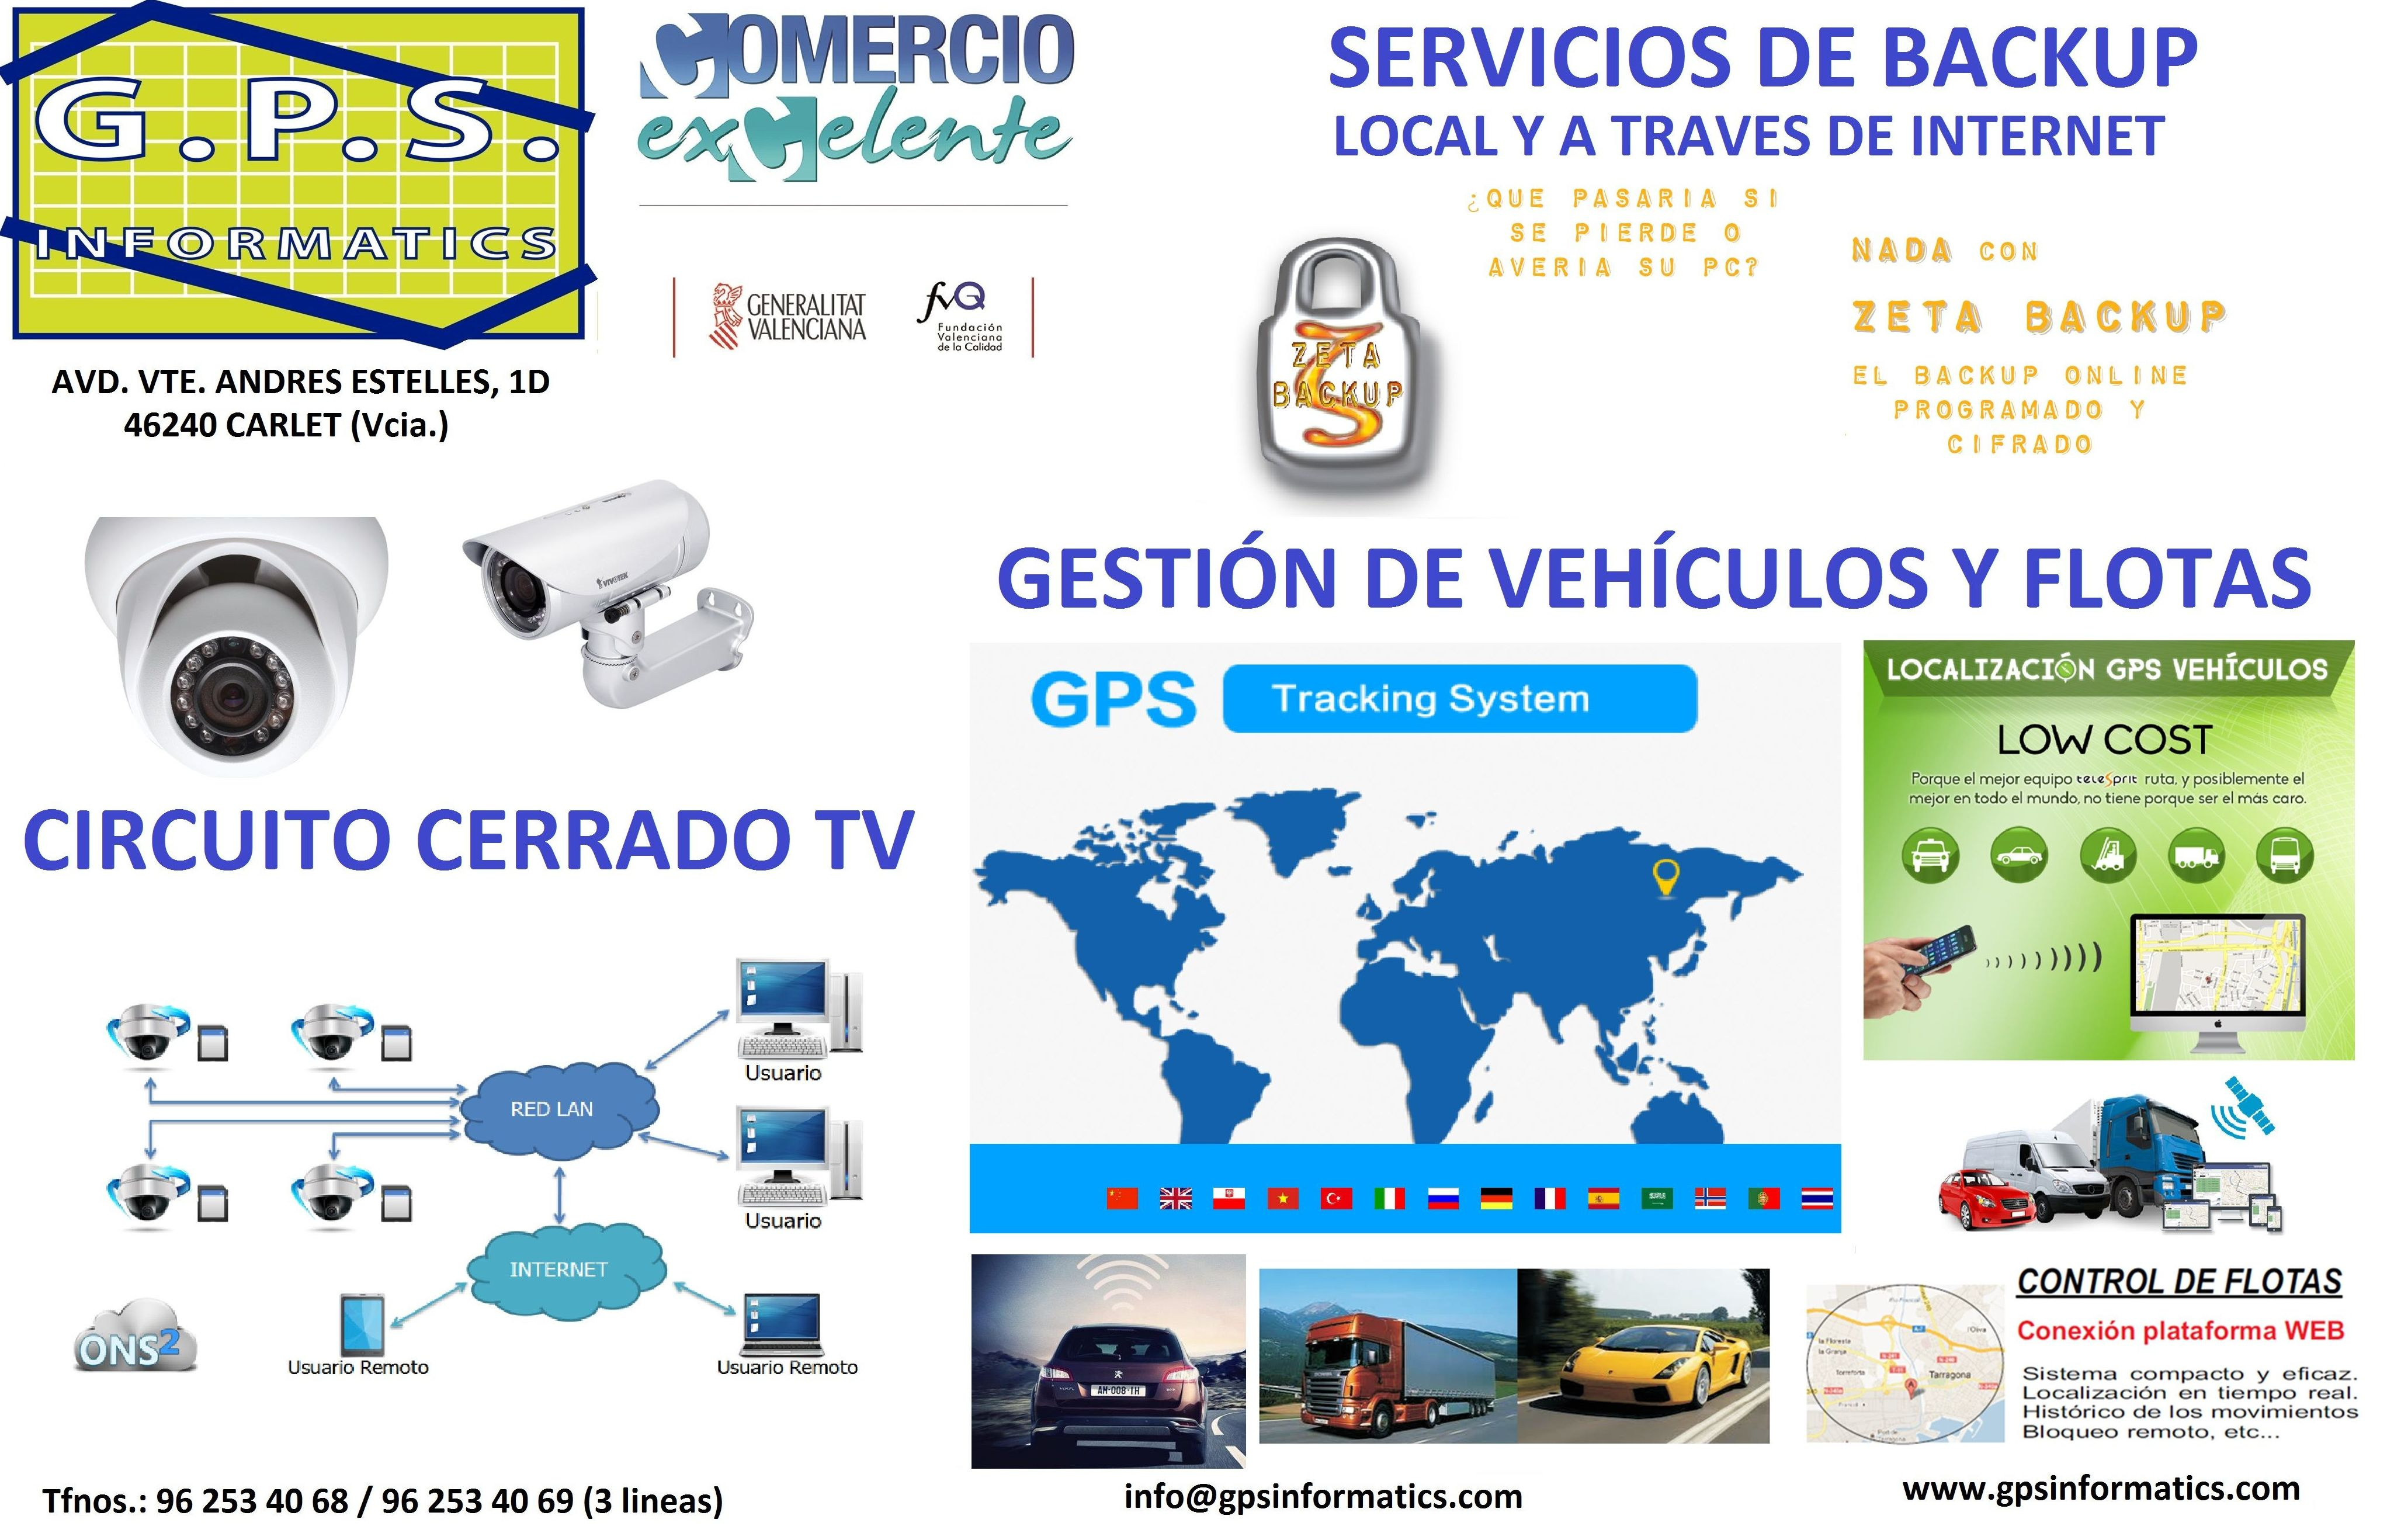 Foto 2 de Informática (hardware y software) en Carlet | G.P.S. Informàtics, S.L.